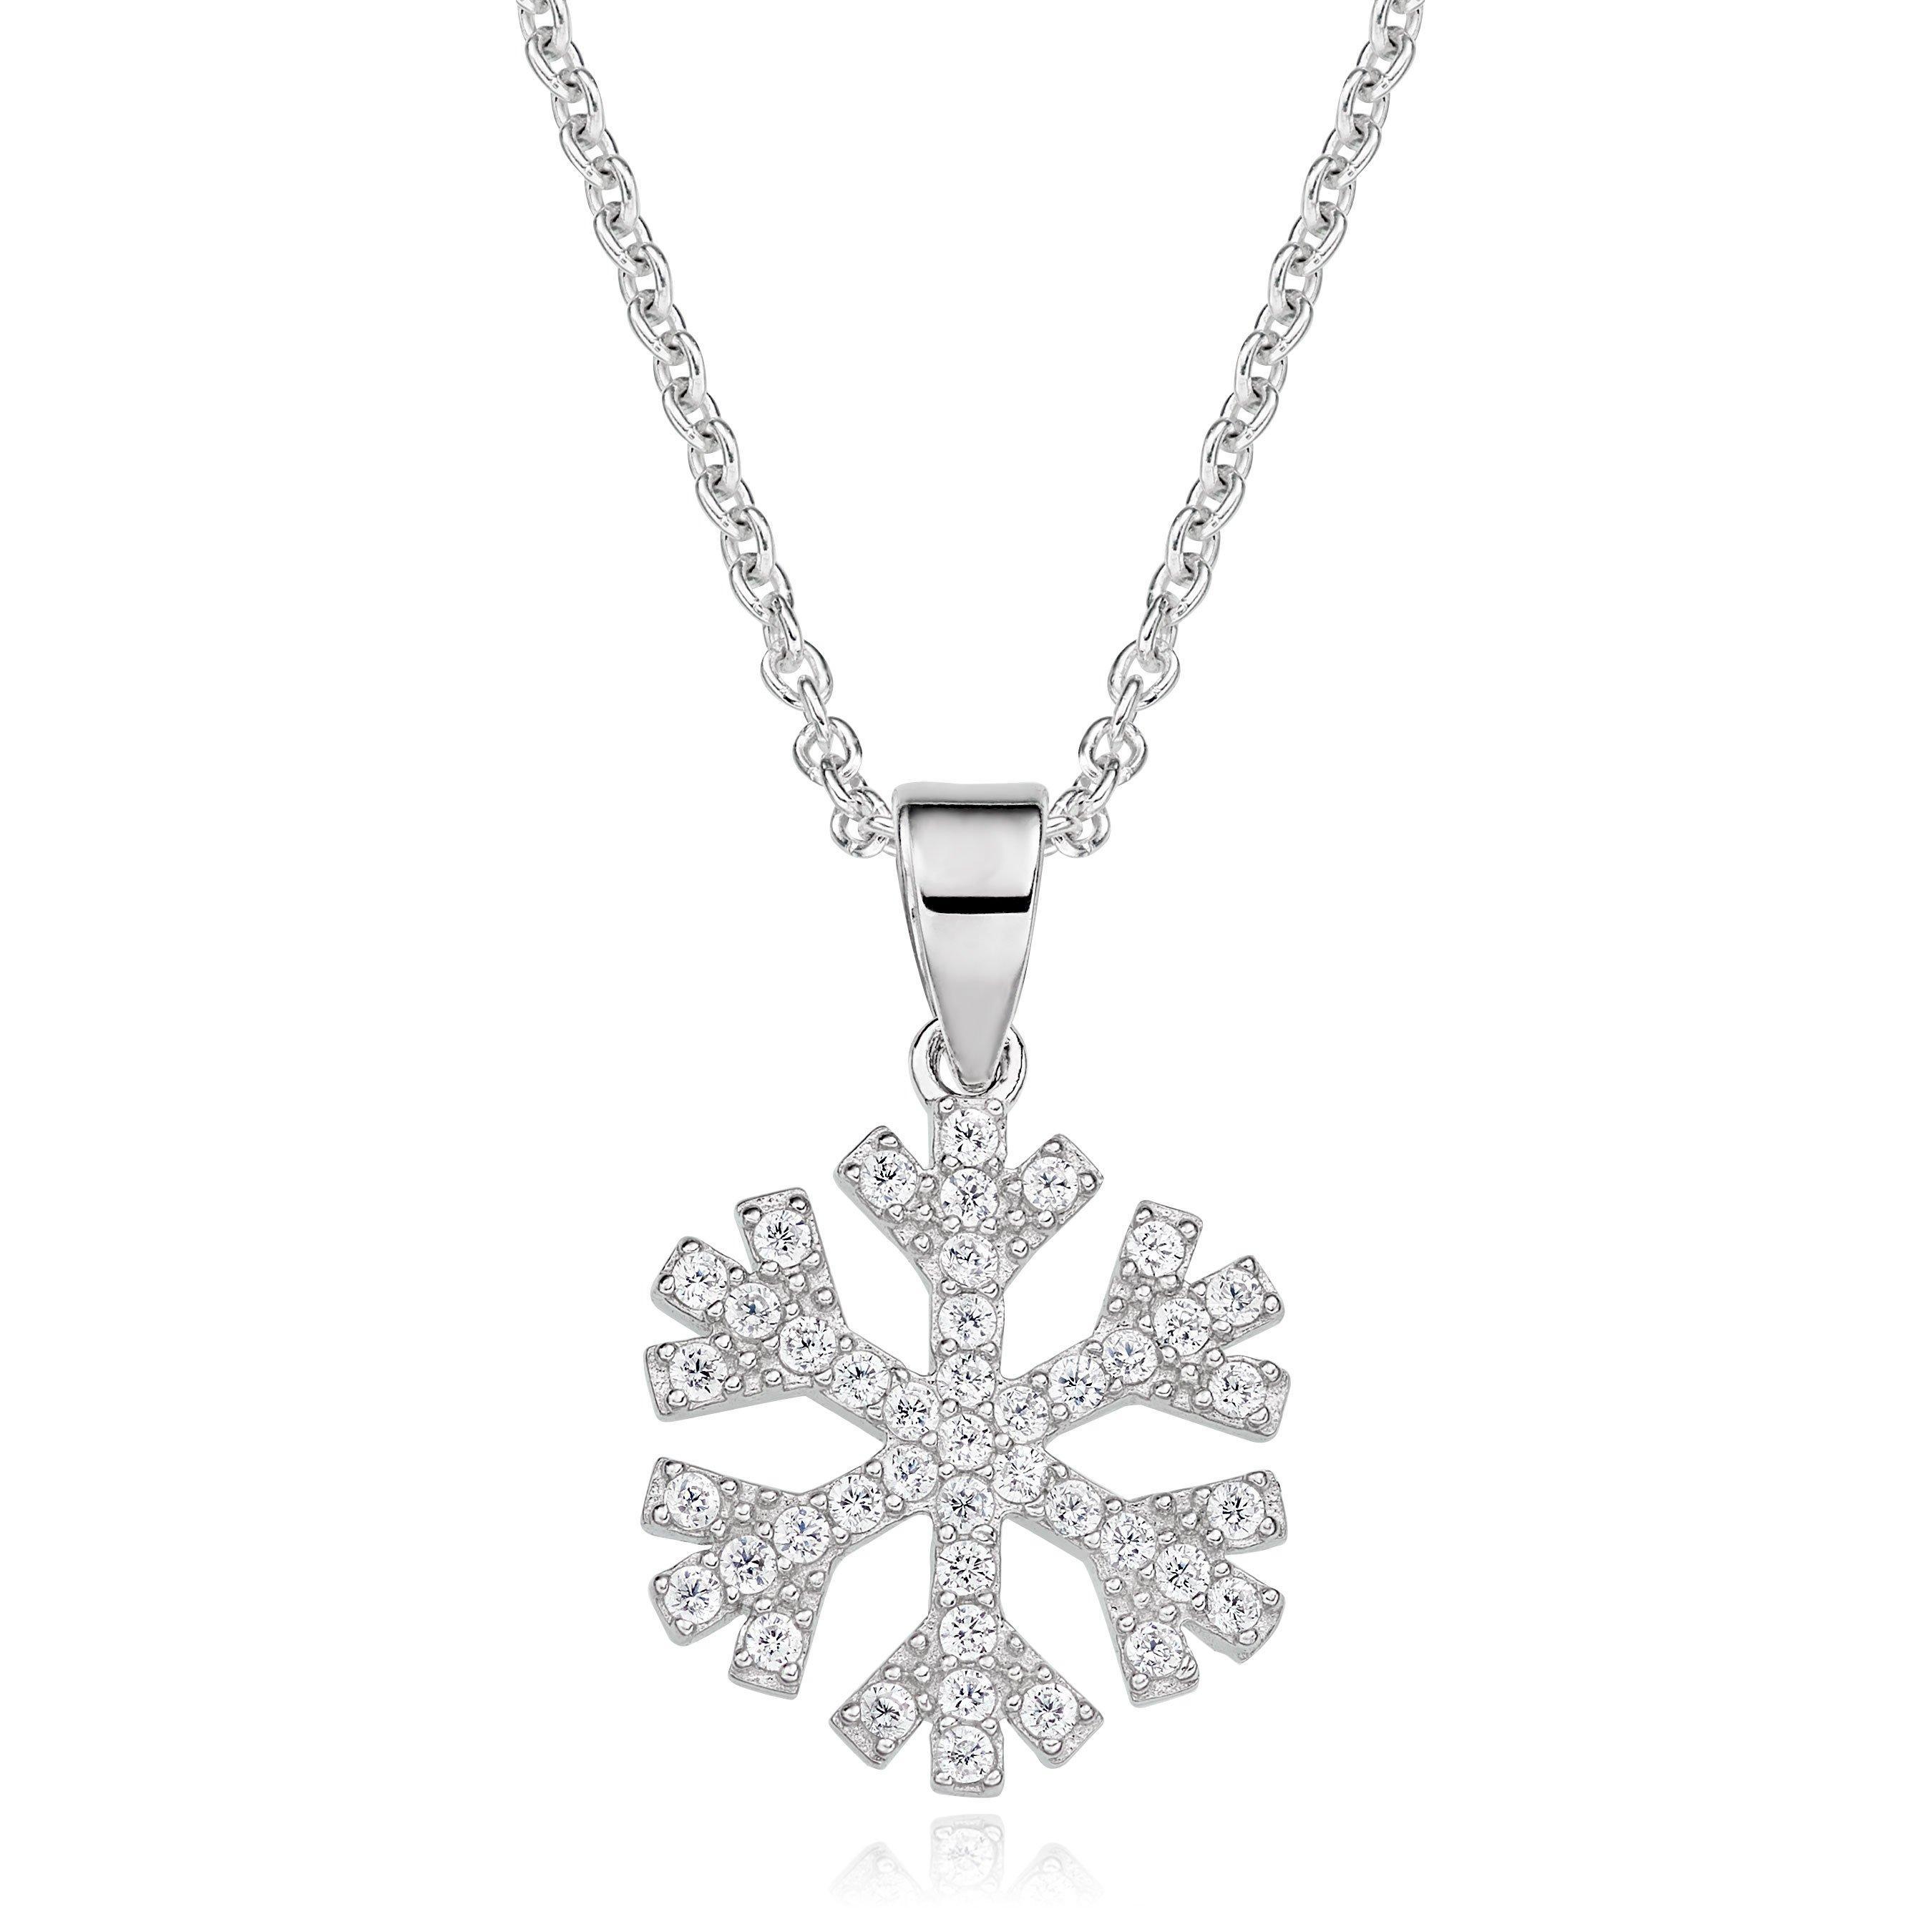 Silver Cubic Zirconia Snowflake Pendant